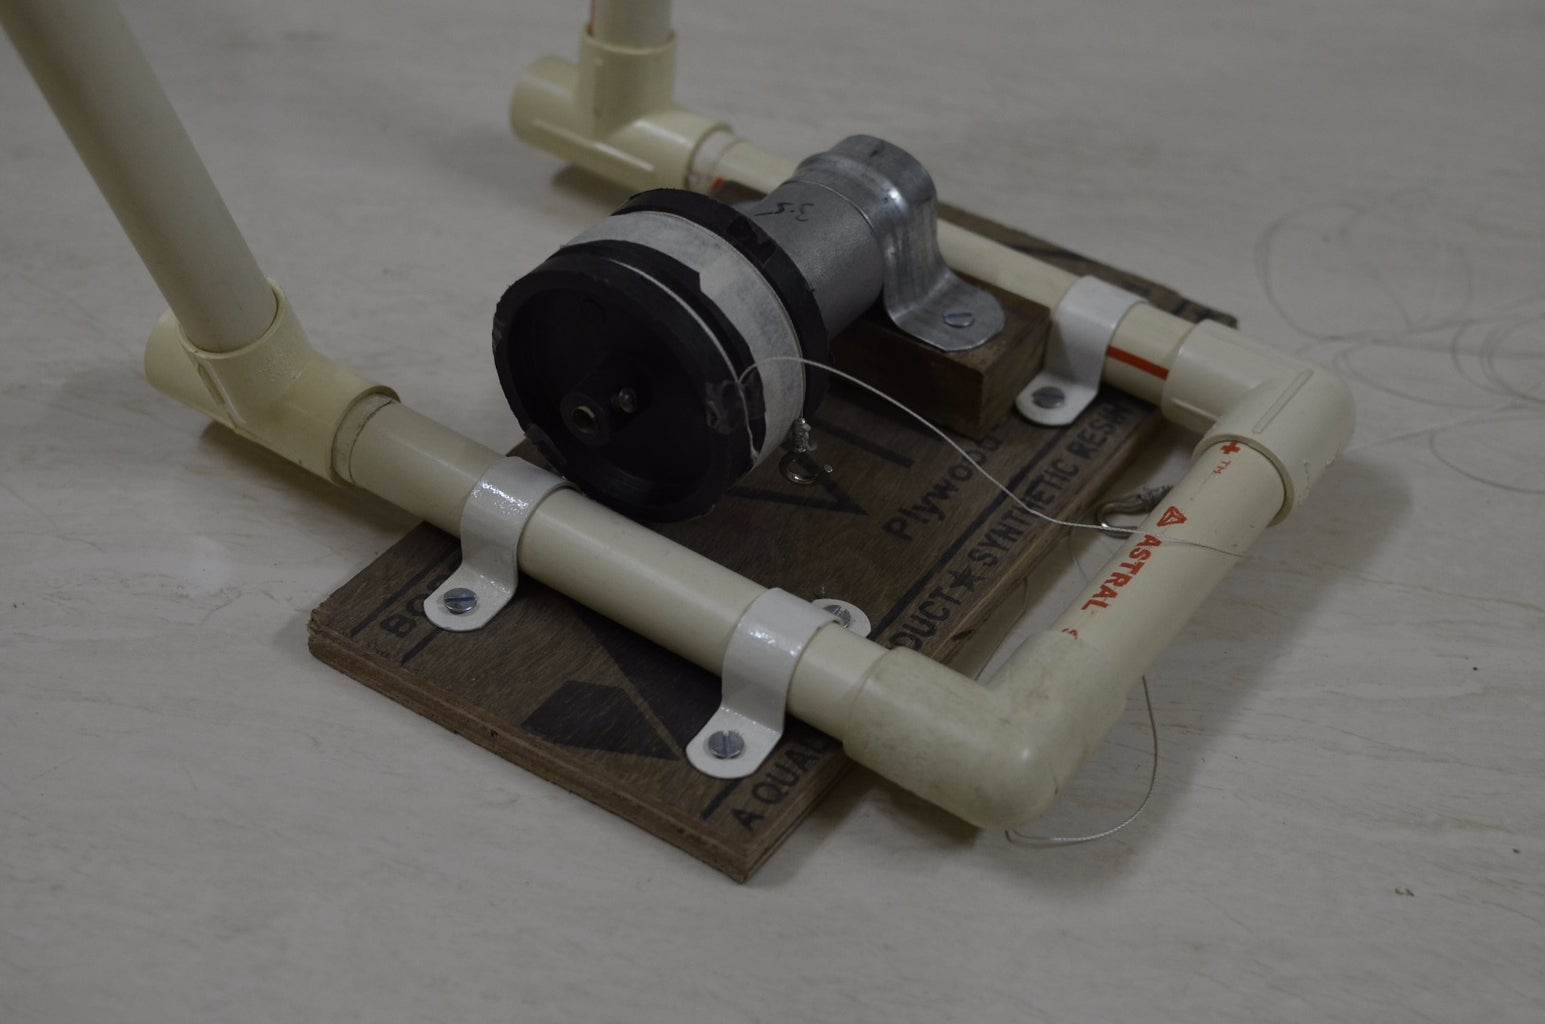 Platform for Arduino Circuit and Motor